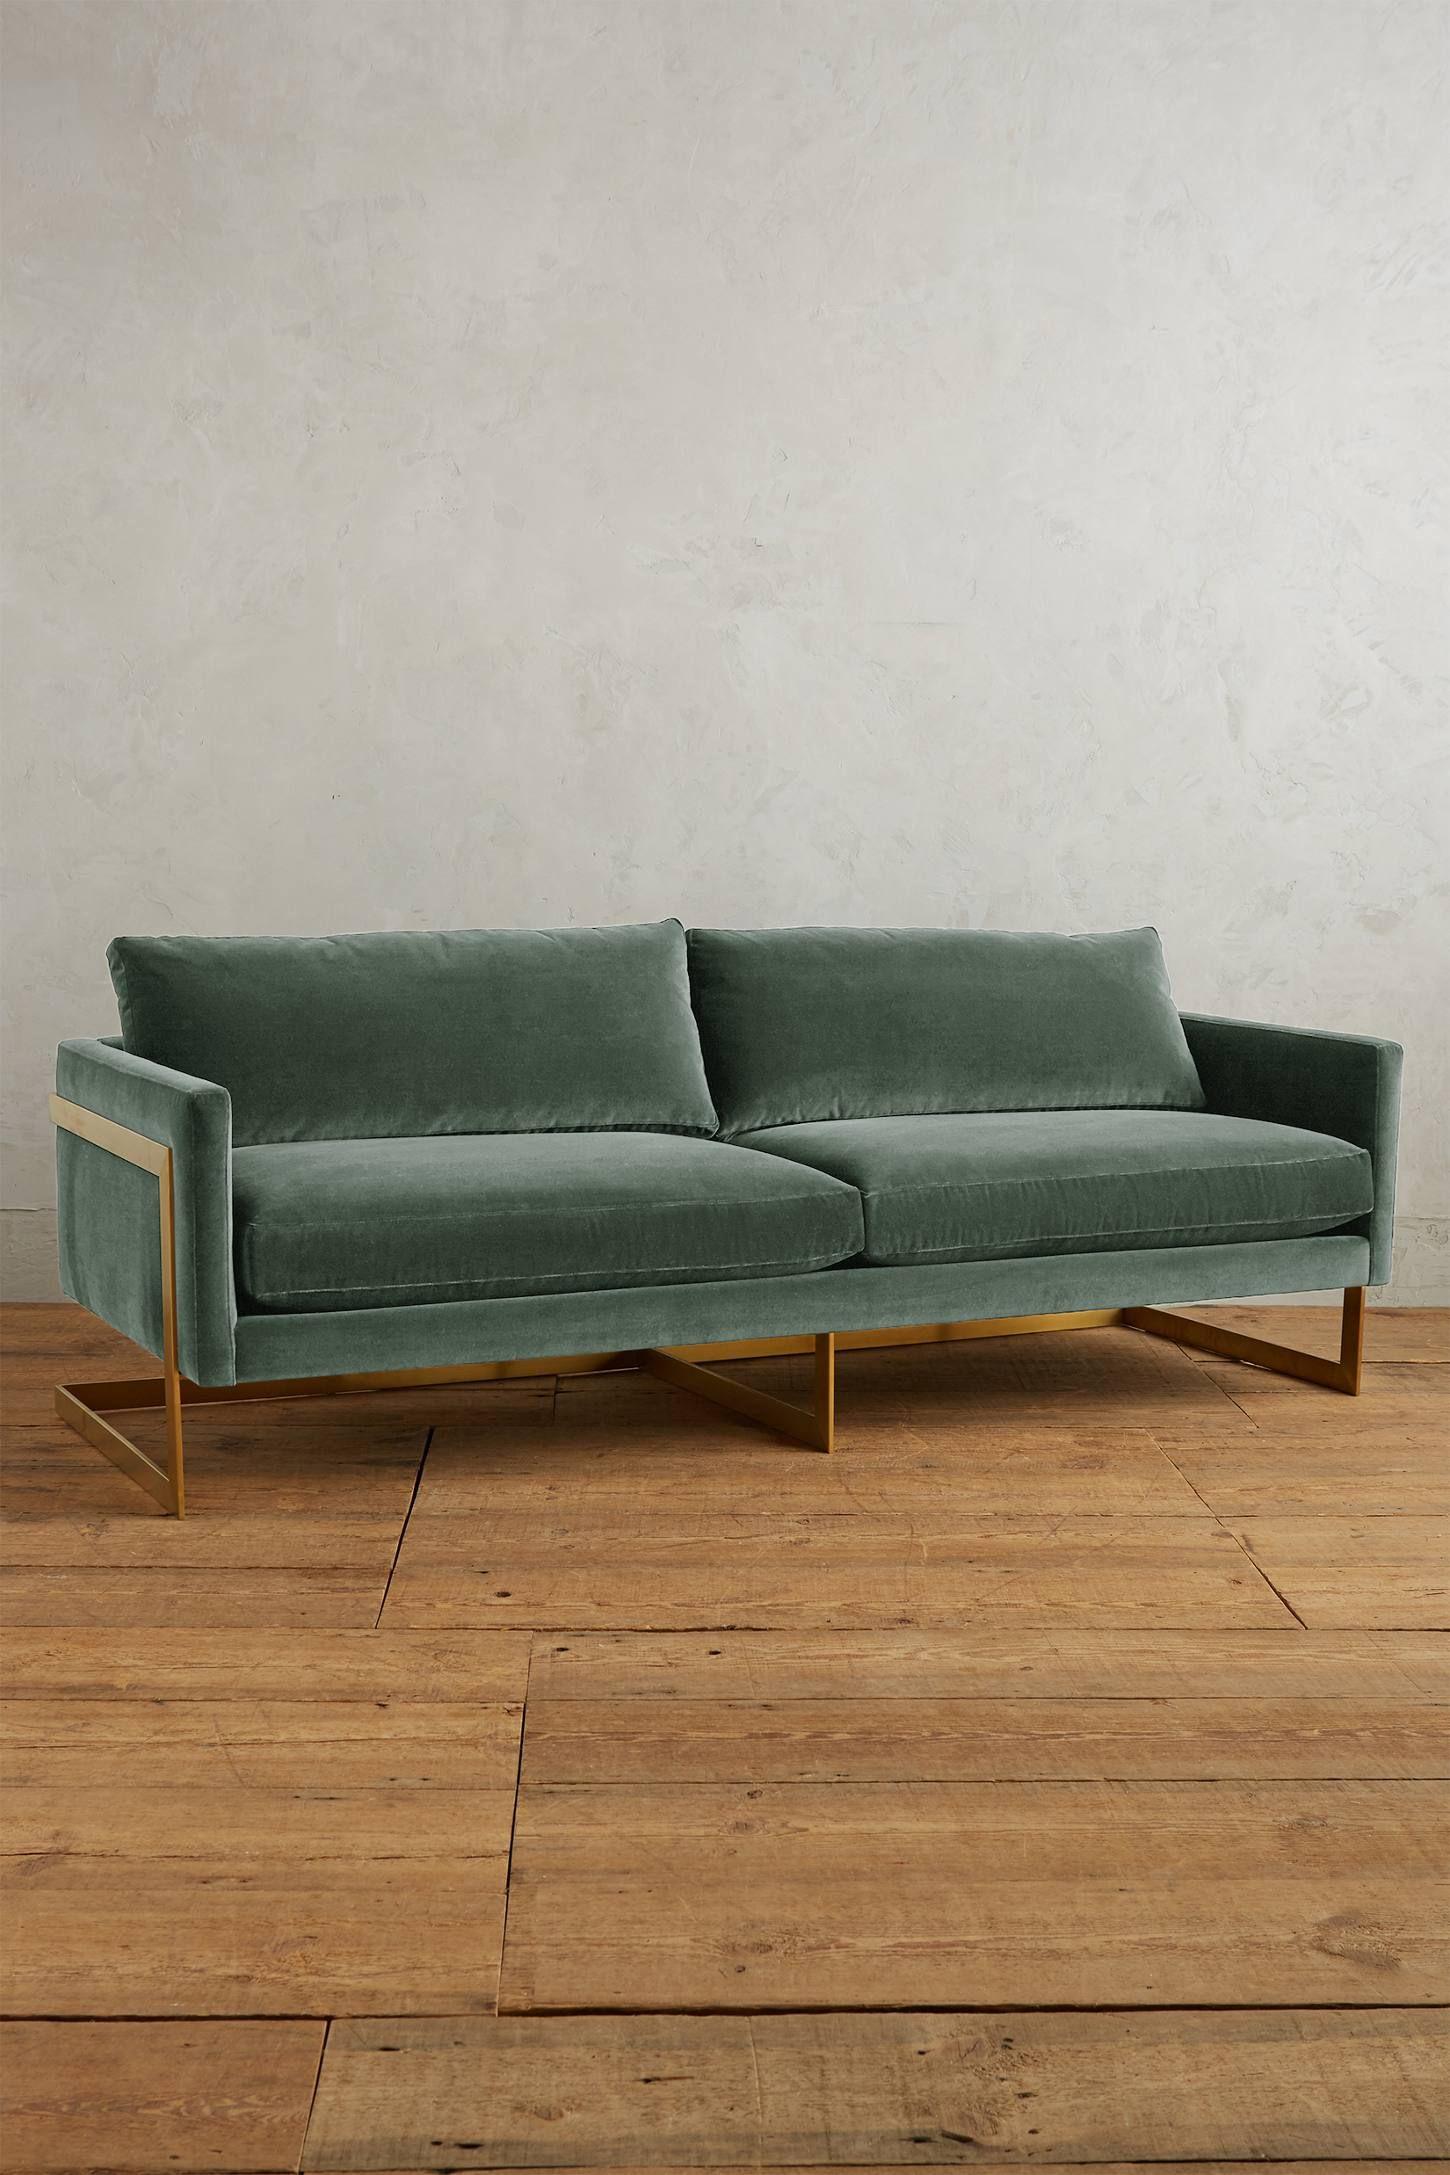 Velvet Meredith Sofa House Furniture Design Sofa Inspiration